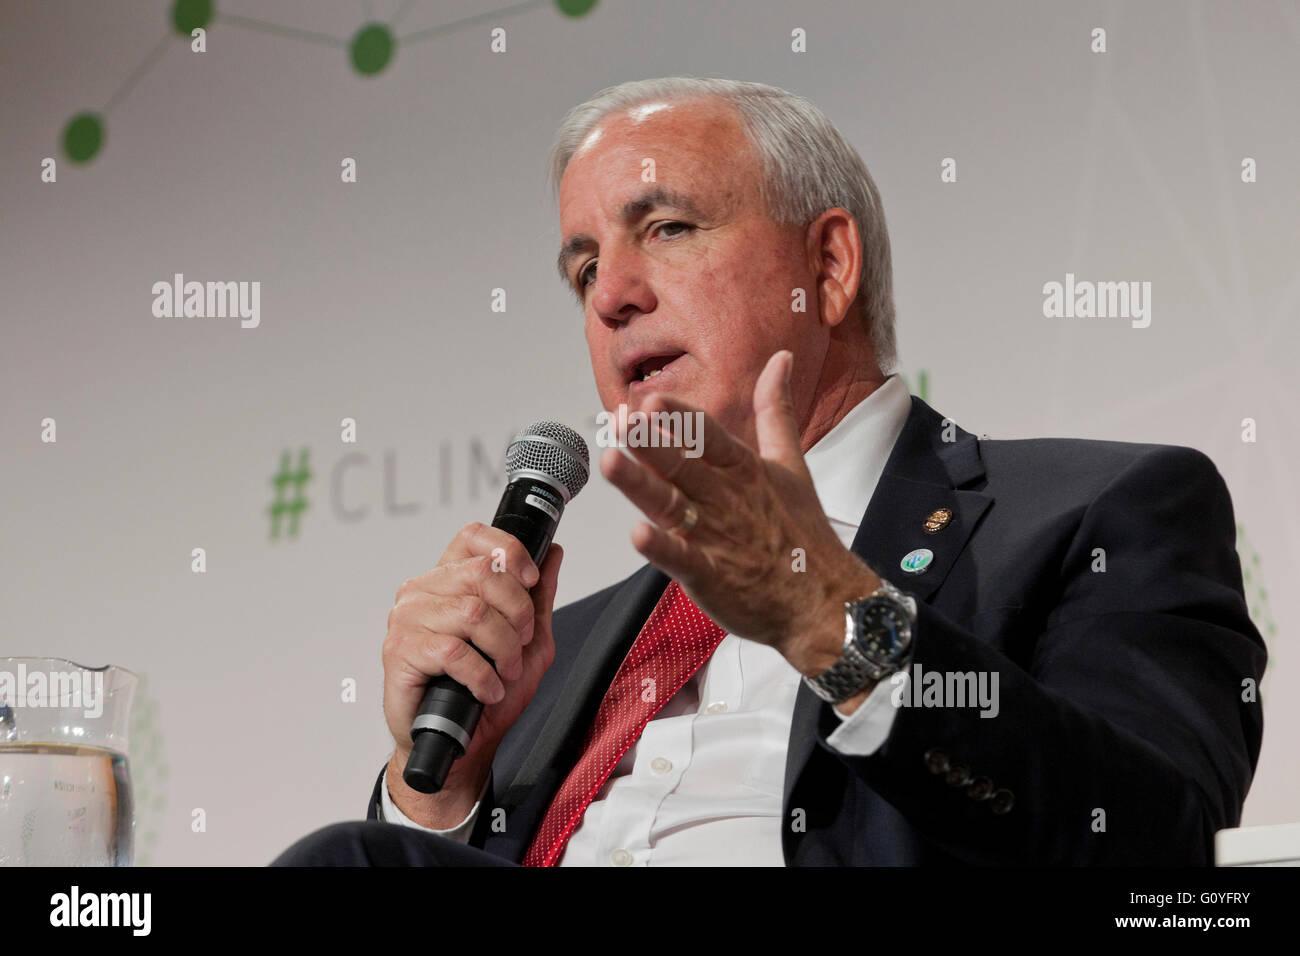 Washington, DC USA. 5th May, 2016:Climate Action 2016 Summit brings global leaders to Washington, DC.  UN Secretary - Stock Image